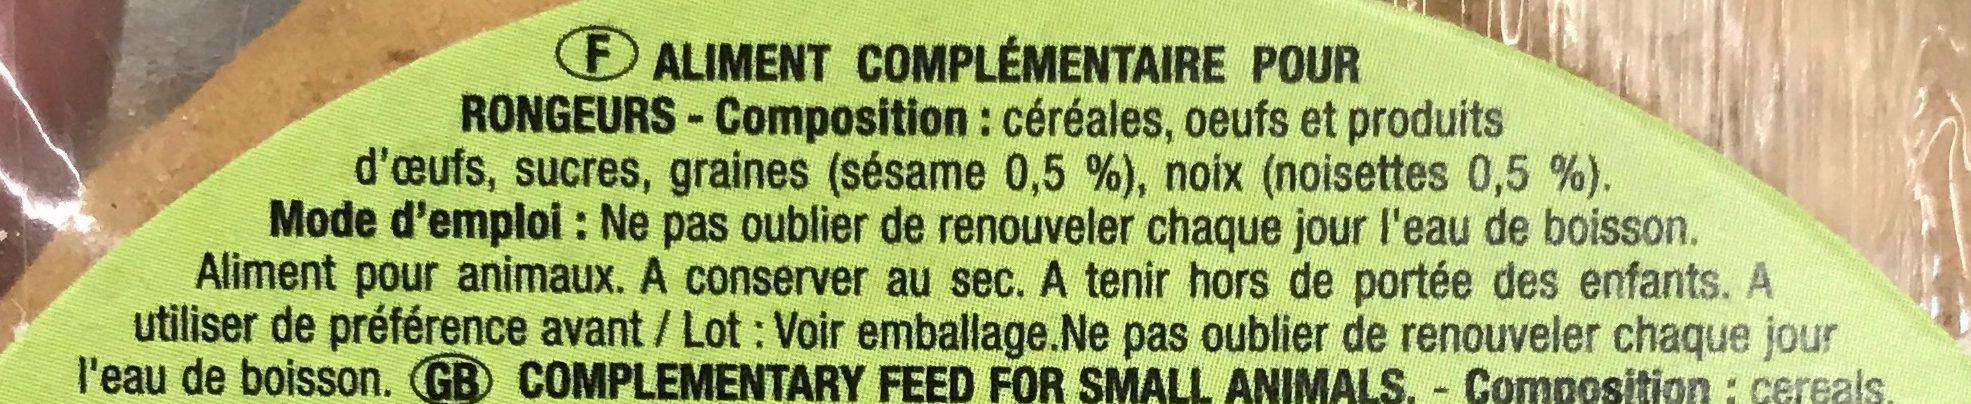 Donut Noisettes - Ingredients - fr